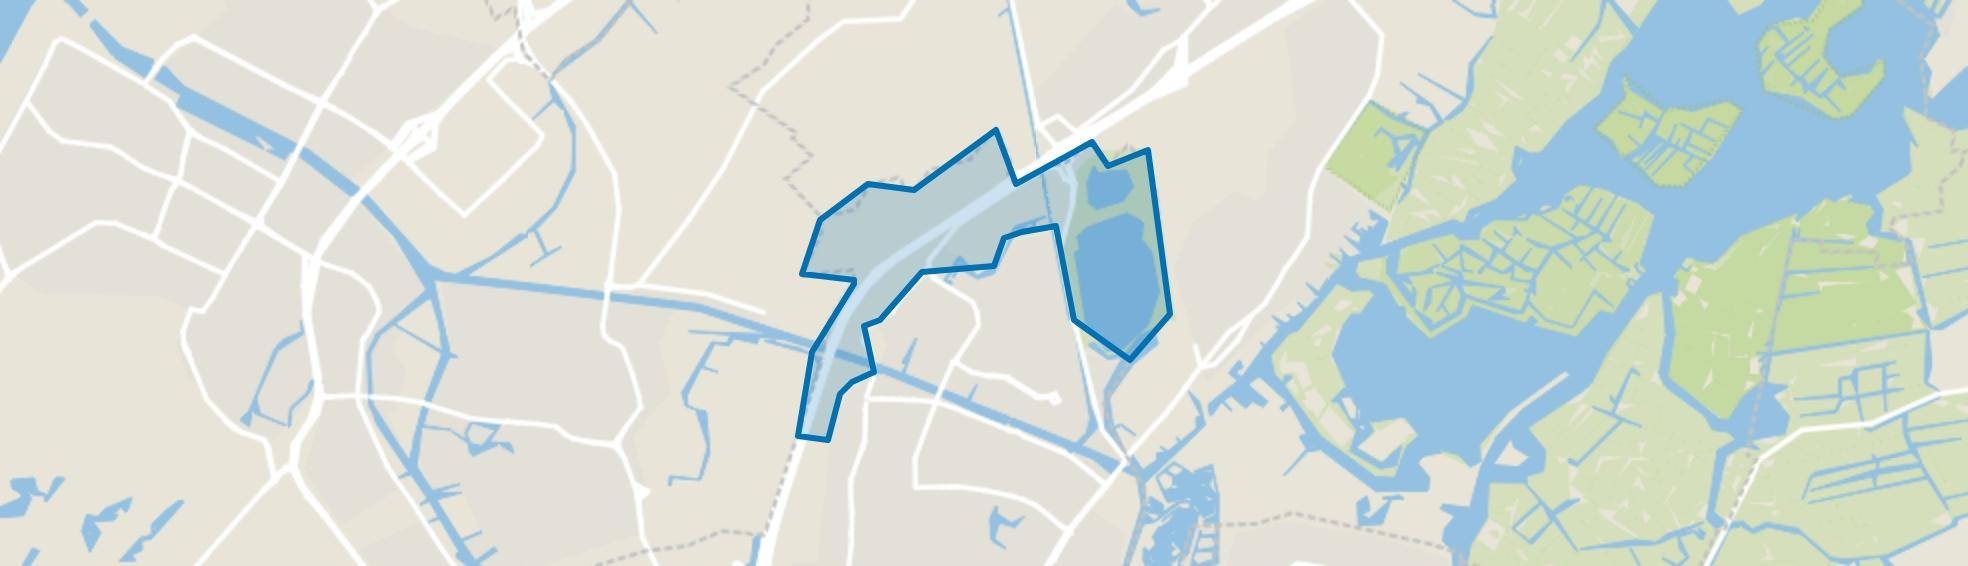 Buitengebied, Oegstgeest map